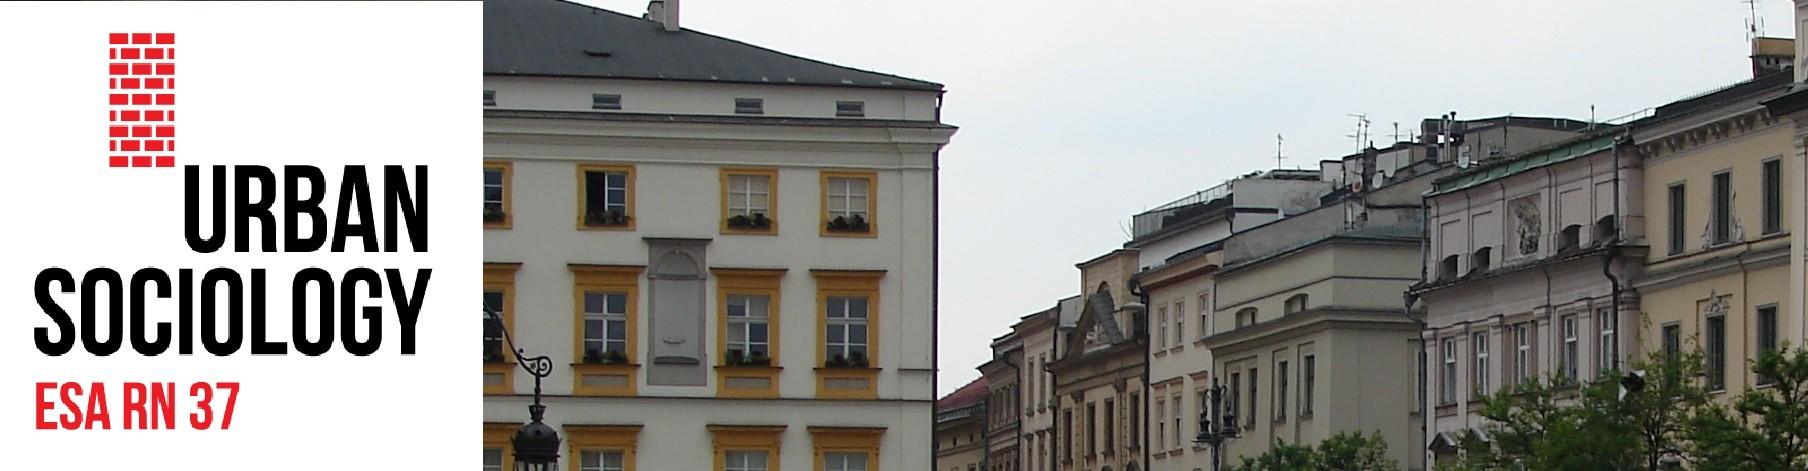 Urban Sociology- The ESA Research Network 37